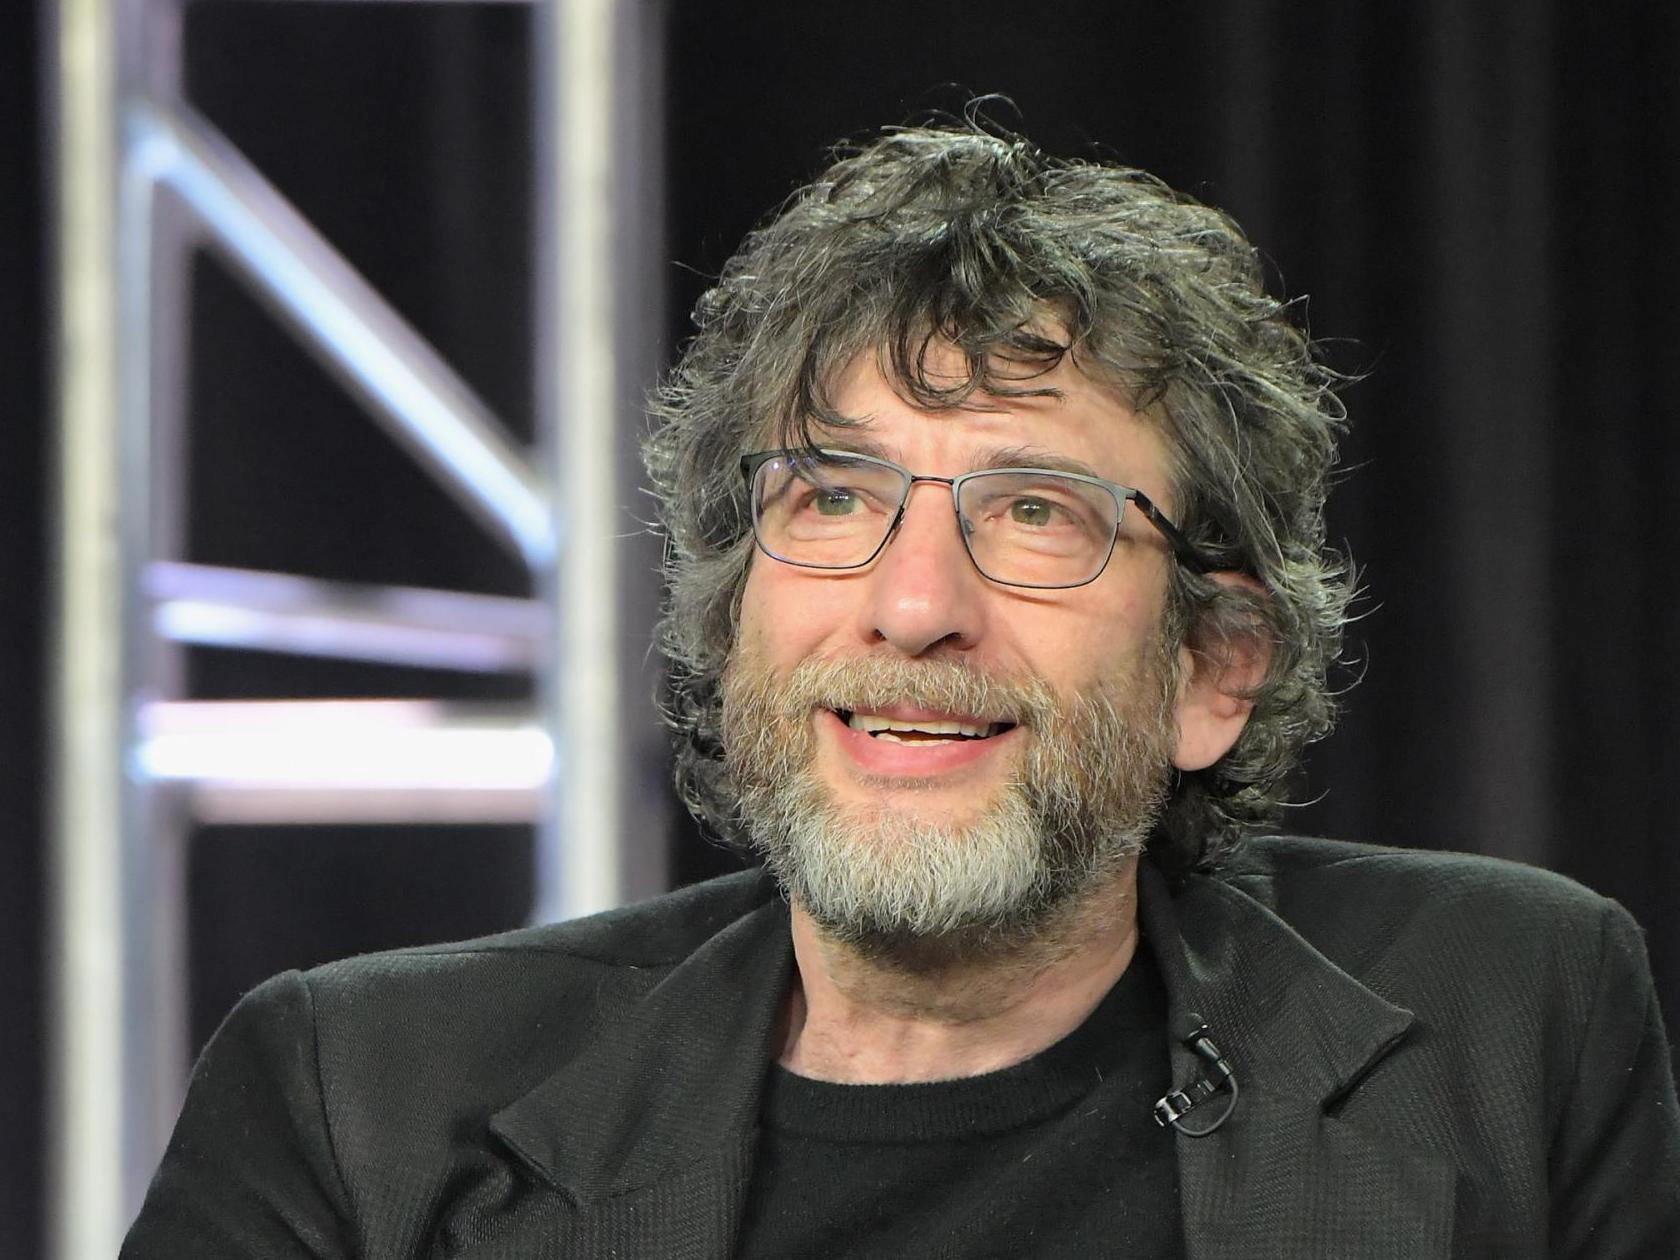 Neil Gaiman apologises for 'stupid' and 'foolish' trip to Skye despite Scotland's coronavirus lockdown